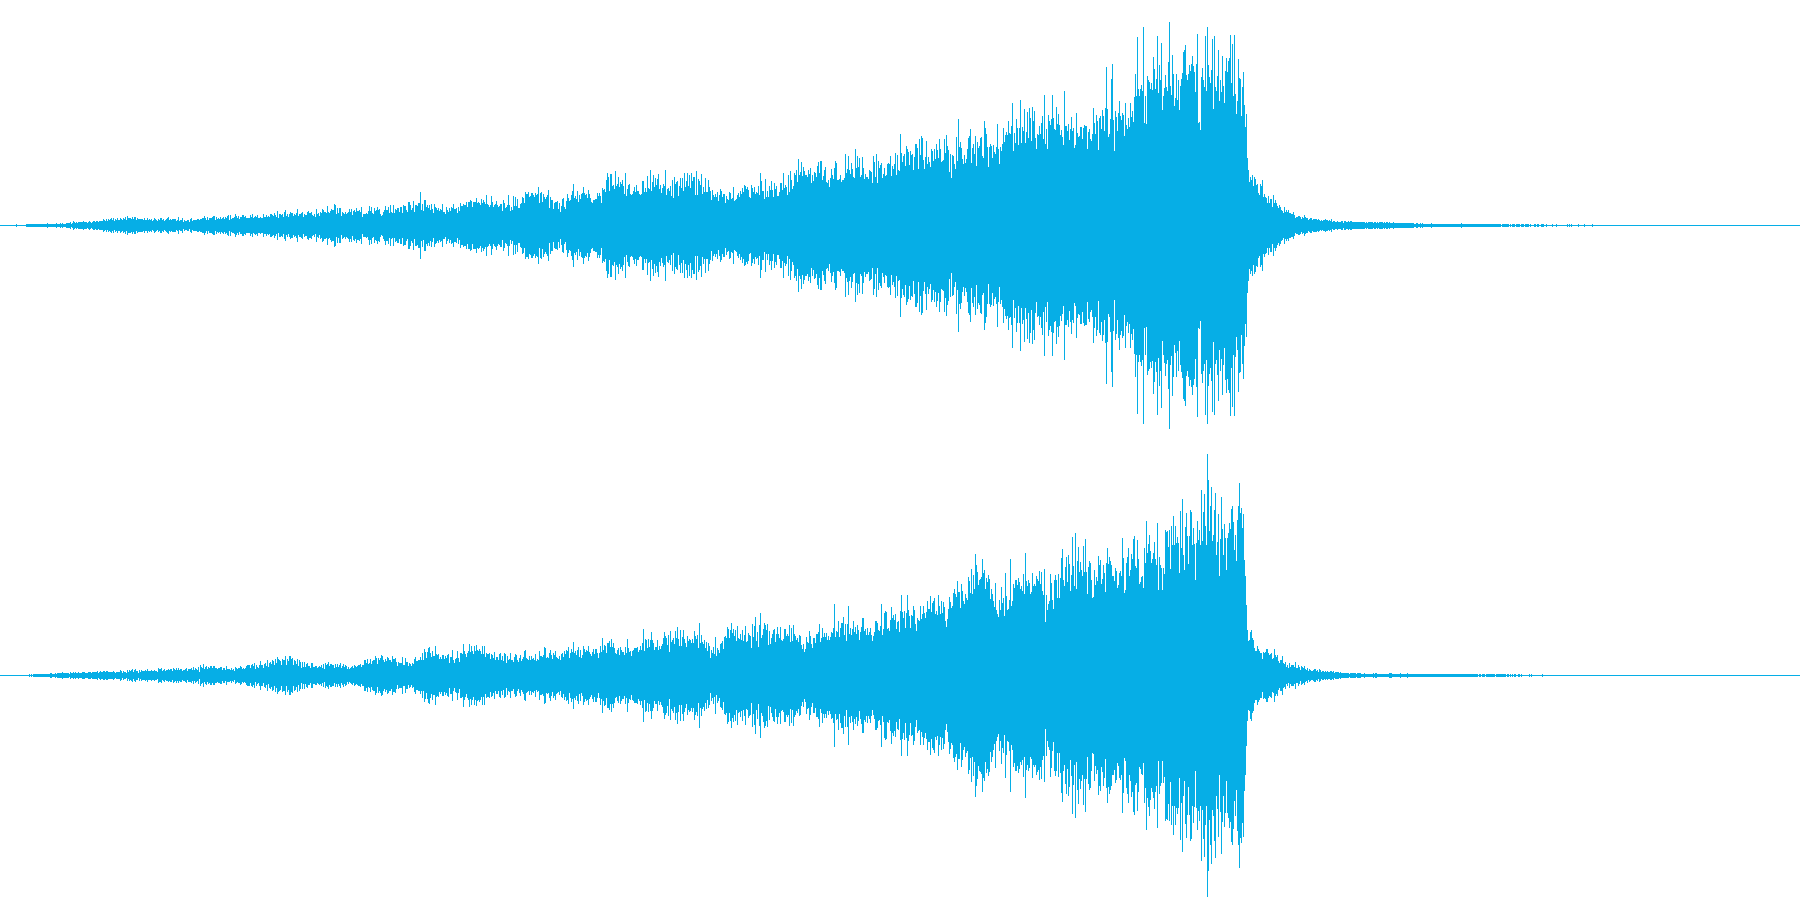 CINEMATIC RISER ATMOの再生済みの波形